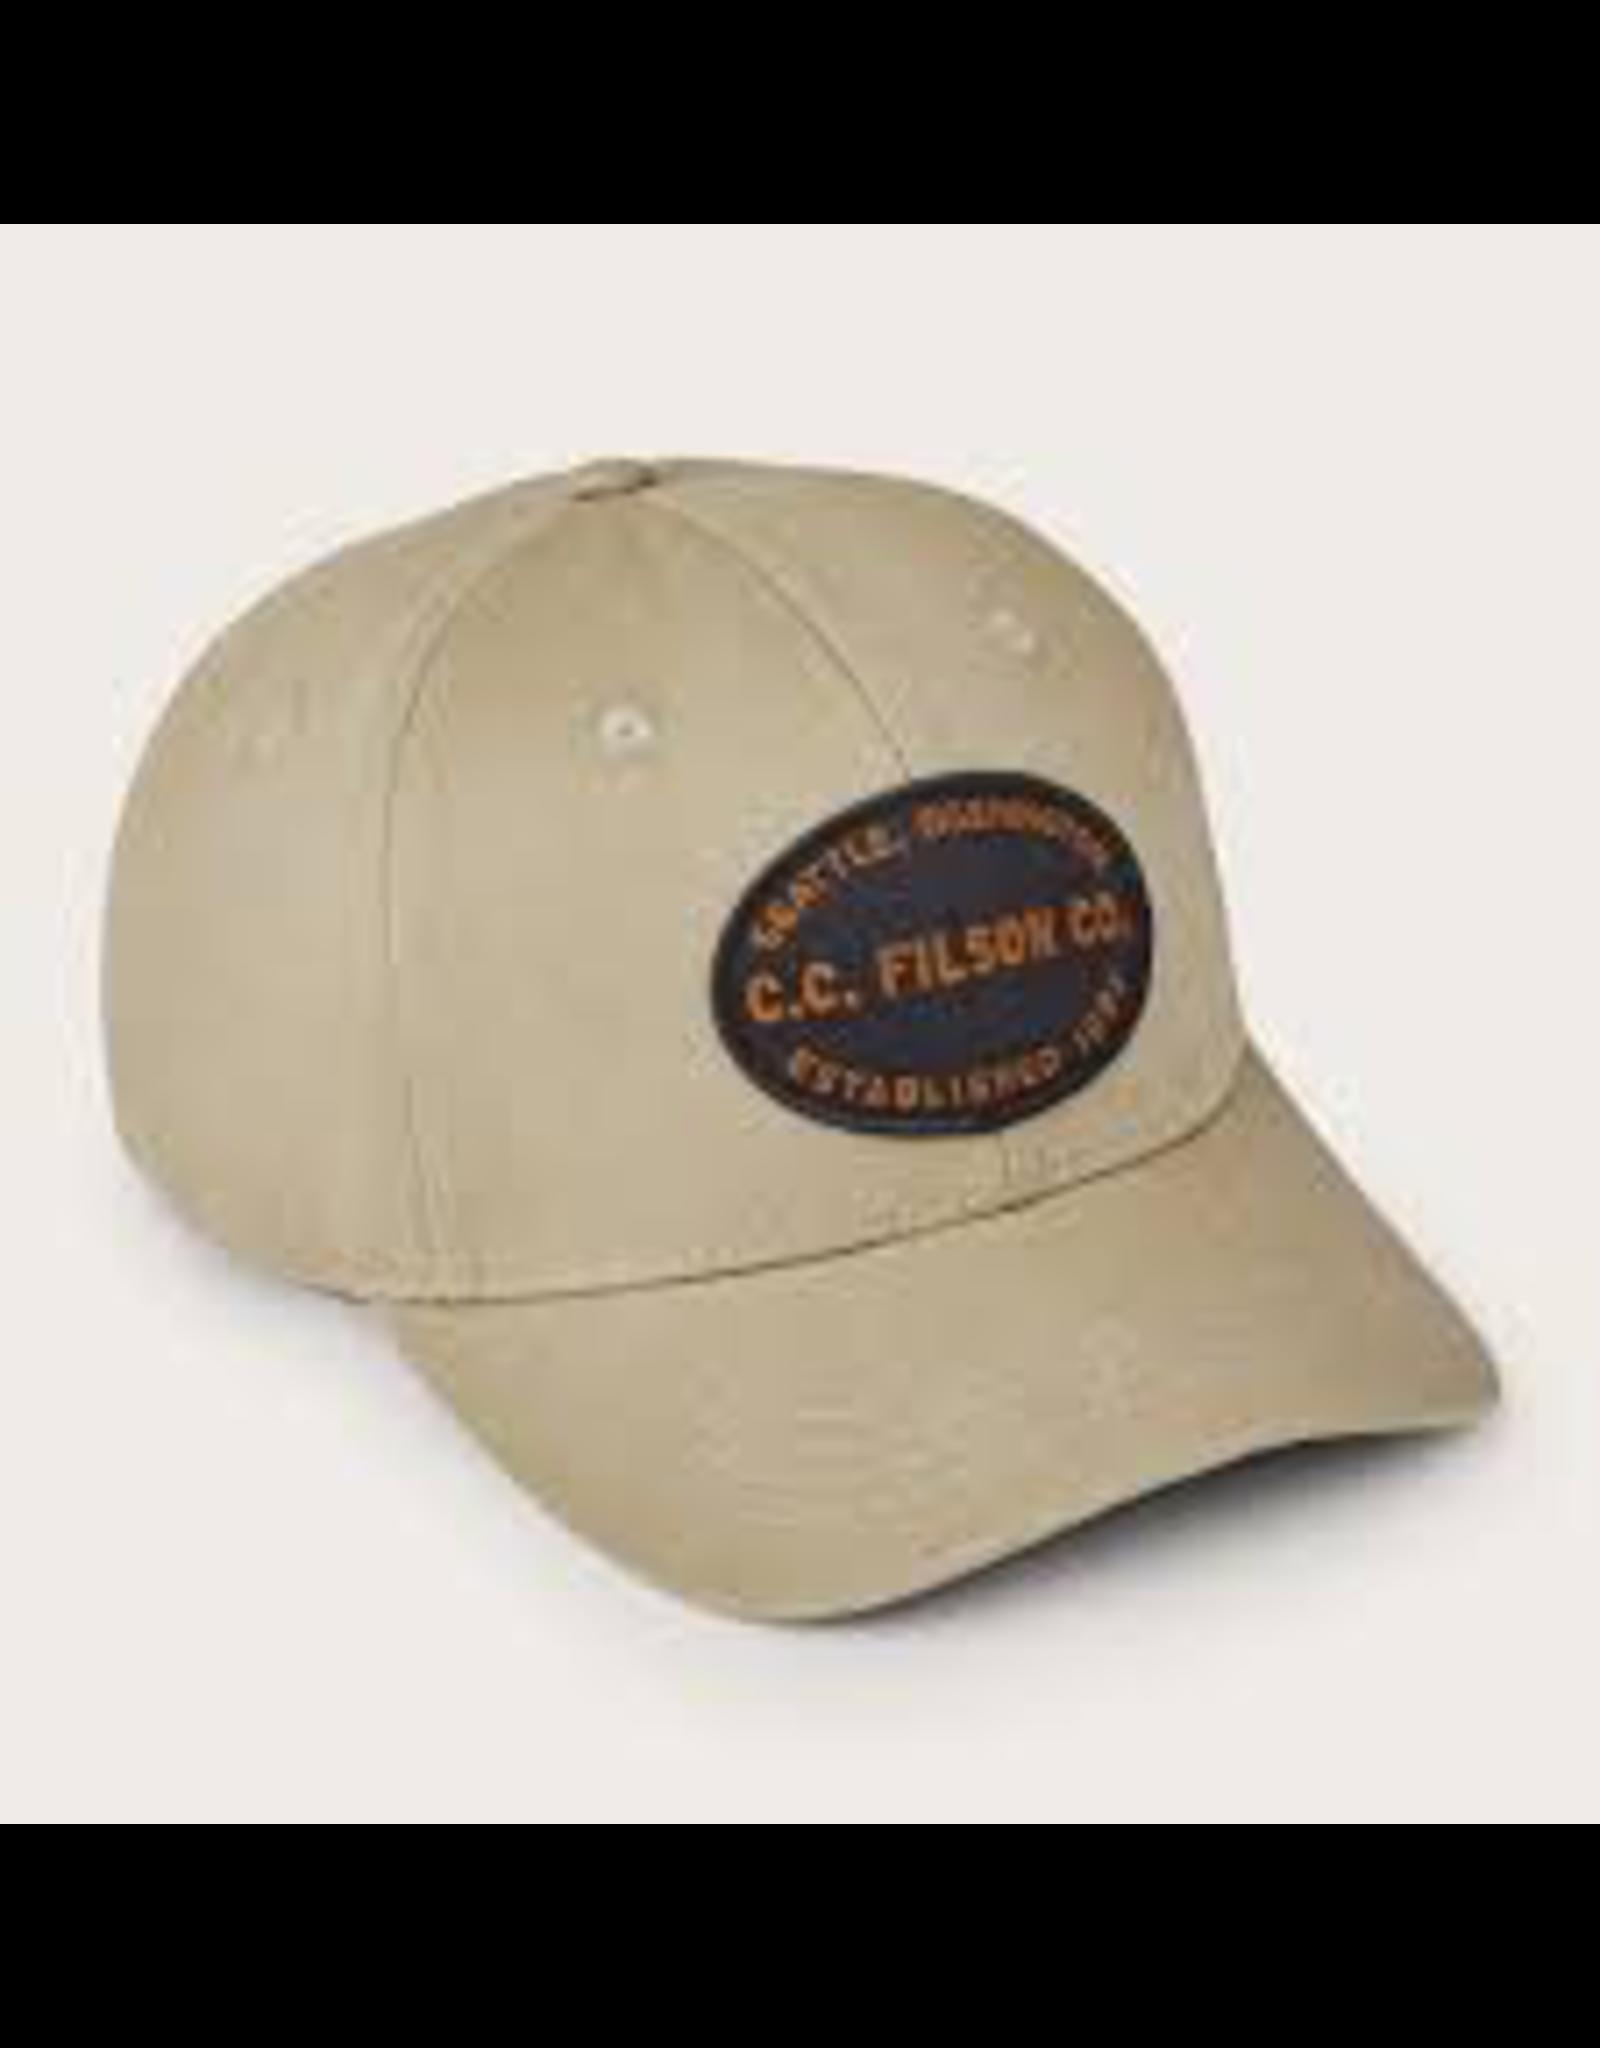 Hats Filson 20116452<br /> Twill Logger Cap Beige